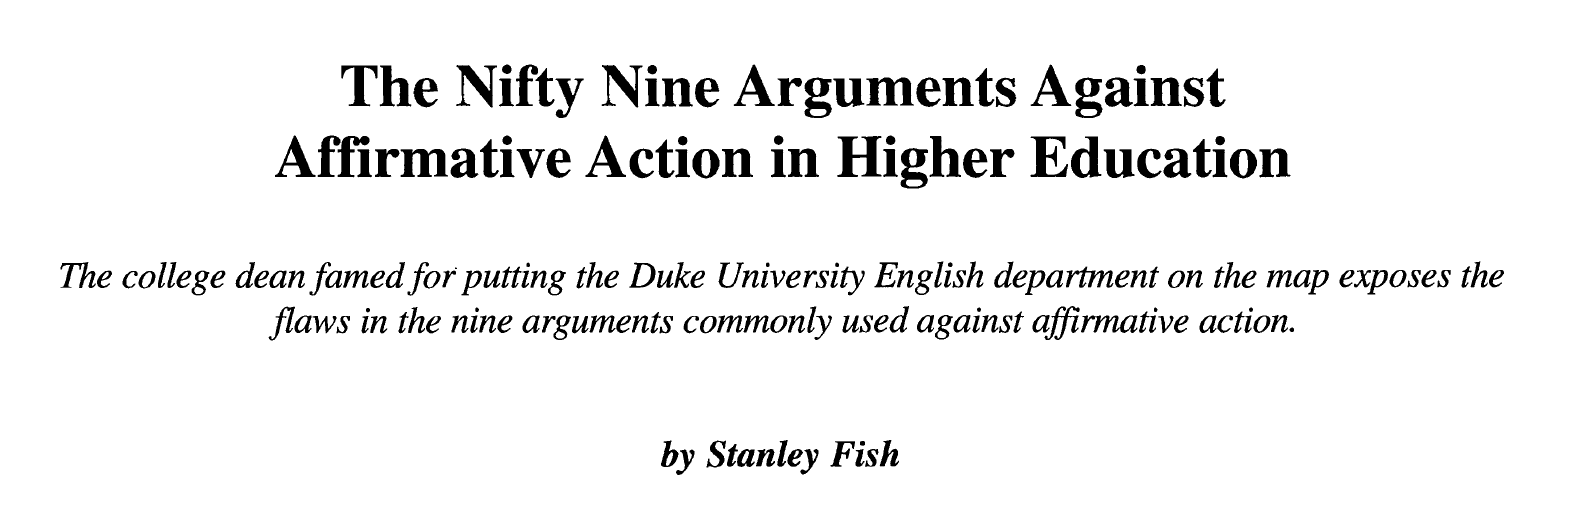 Against affirmative action essay